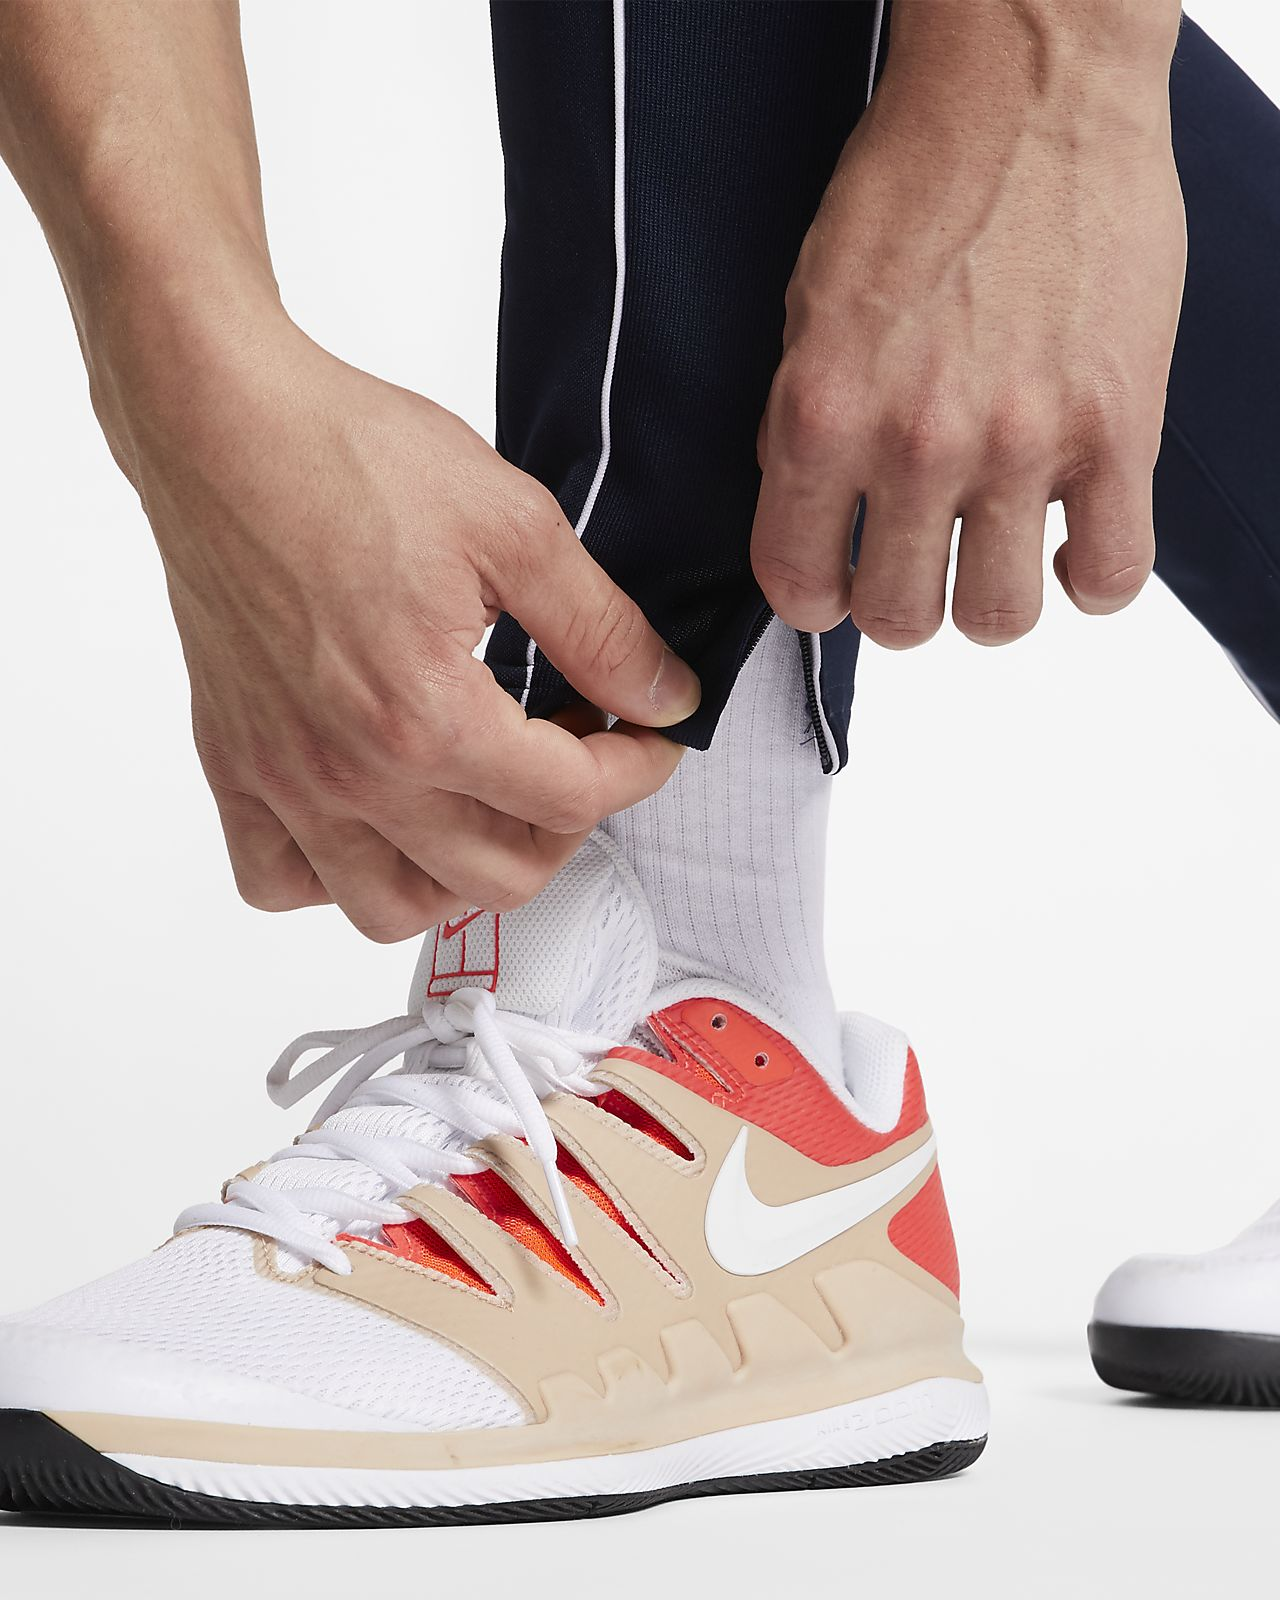 Pour De Pantalon Homme Nikecourt Tennis X8n0wkPO